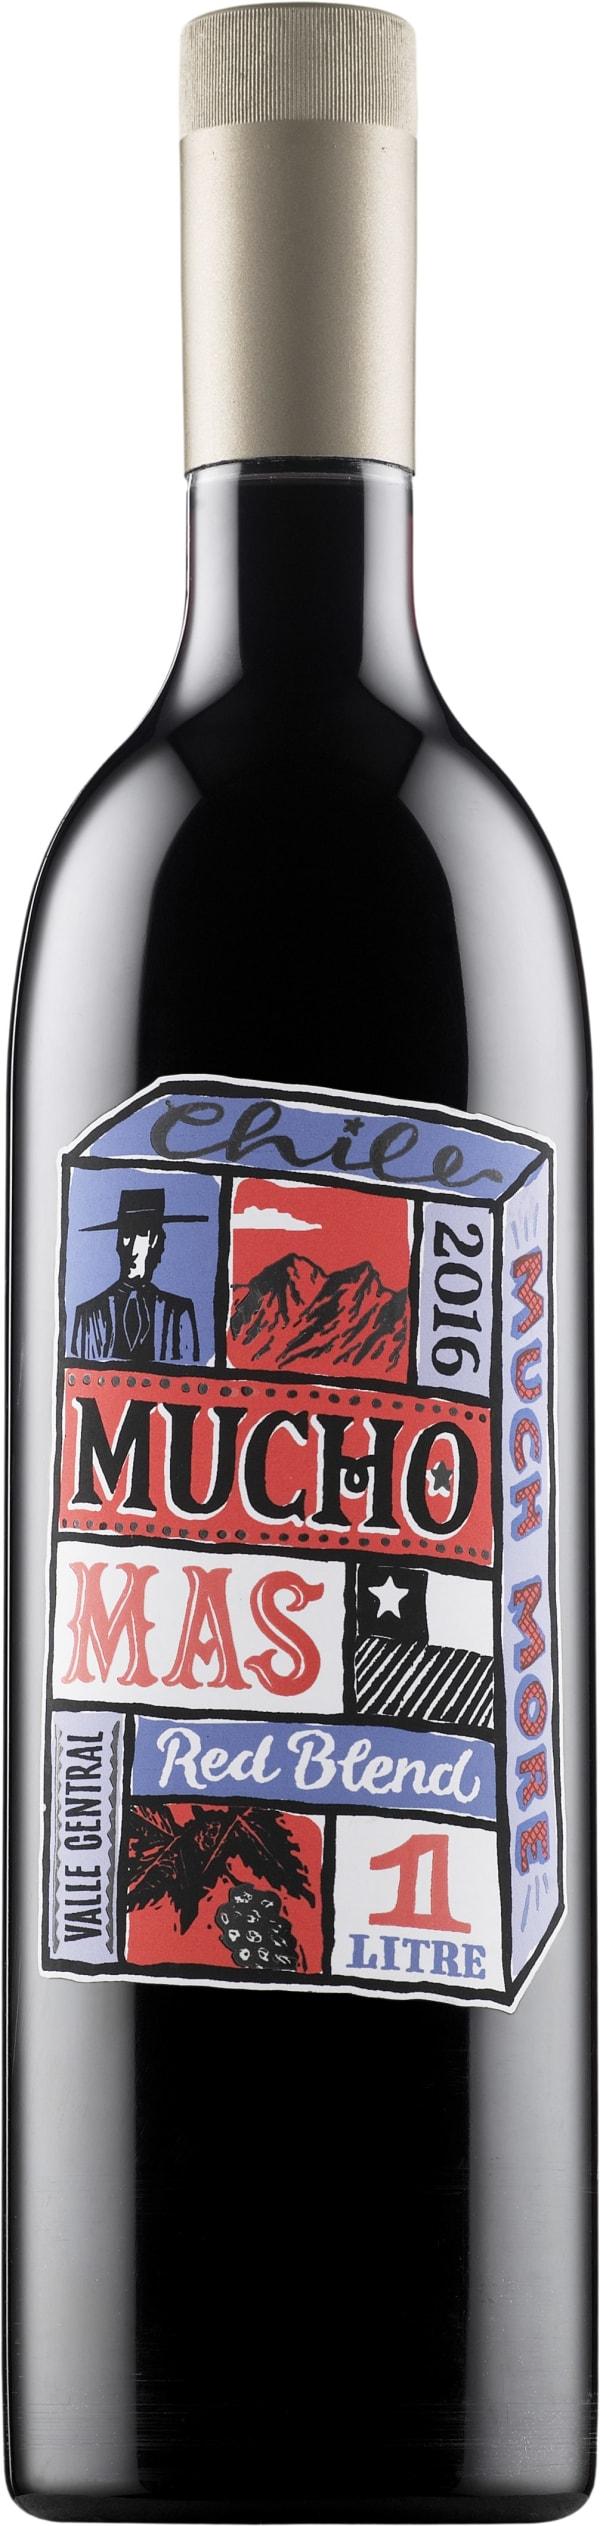 Mucho Mas Red Blend 2016 muovipullo